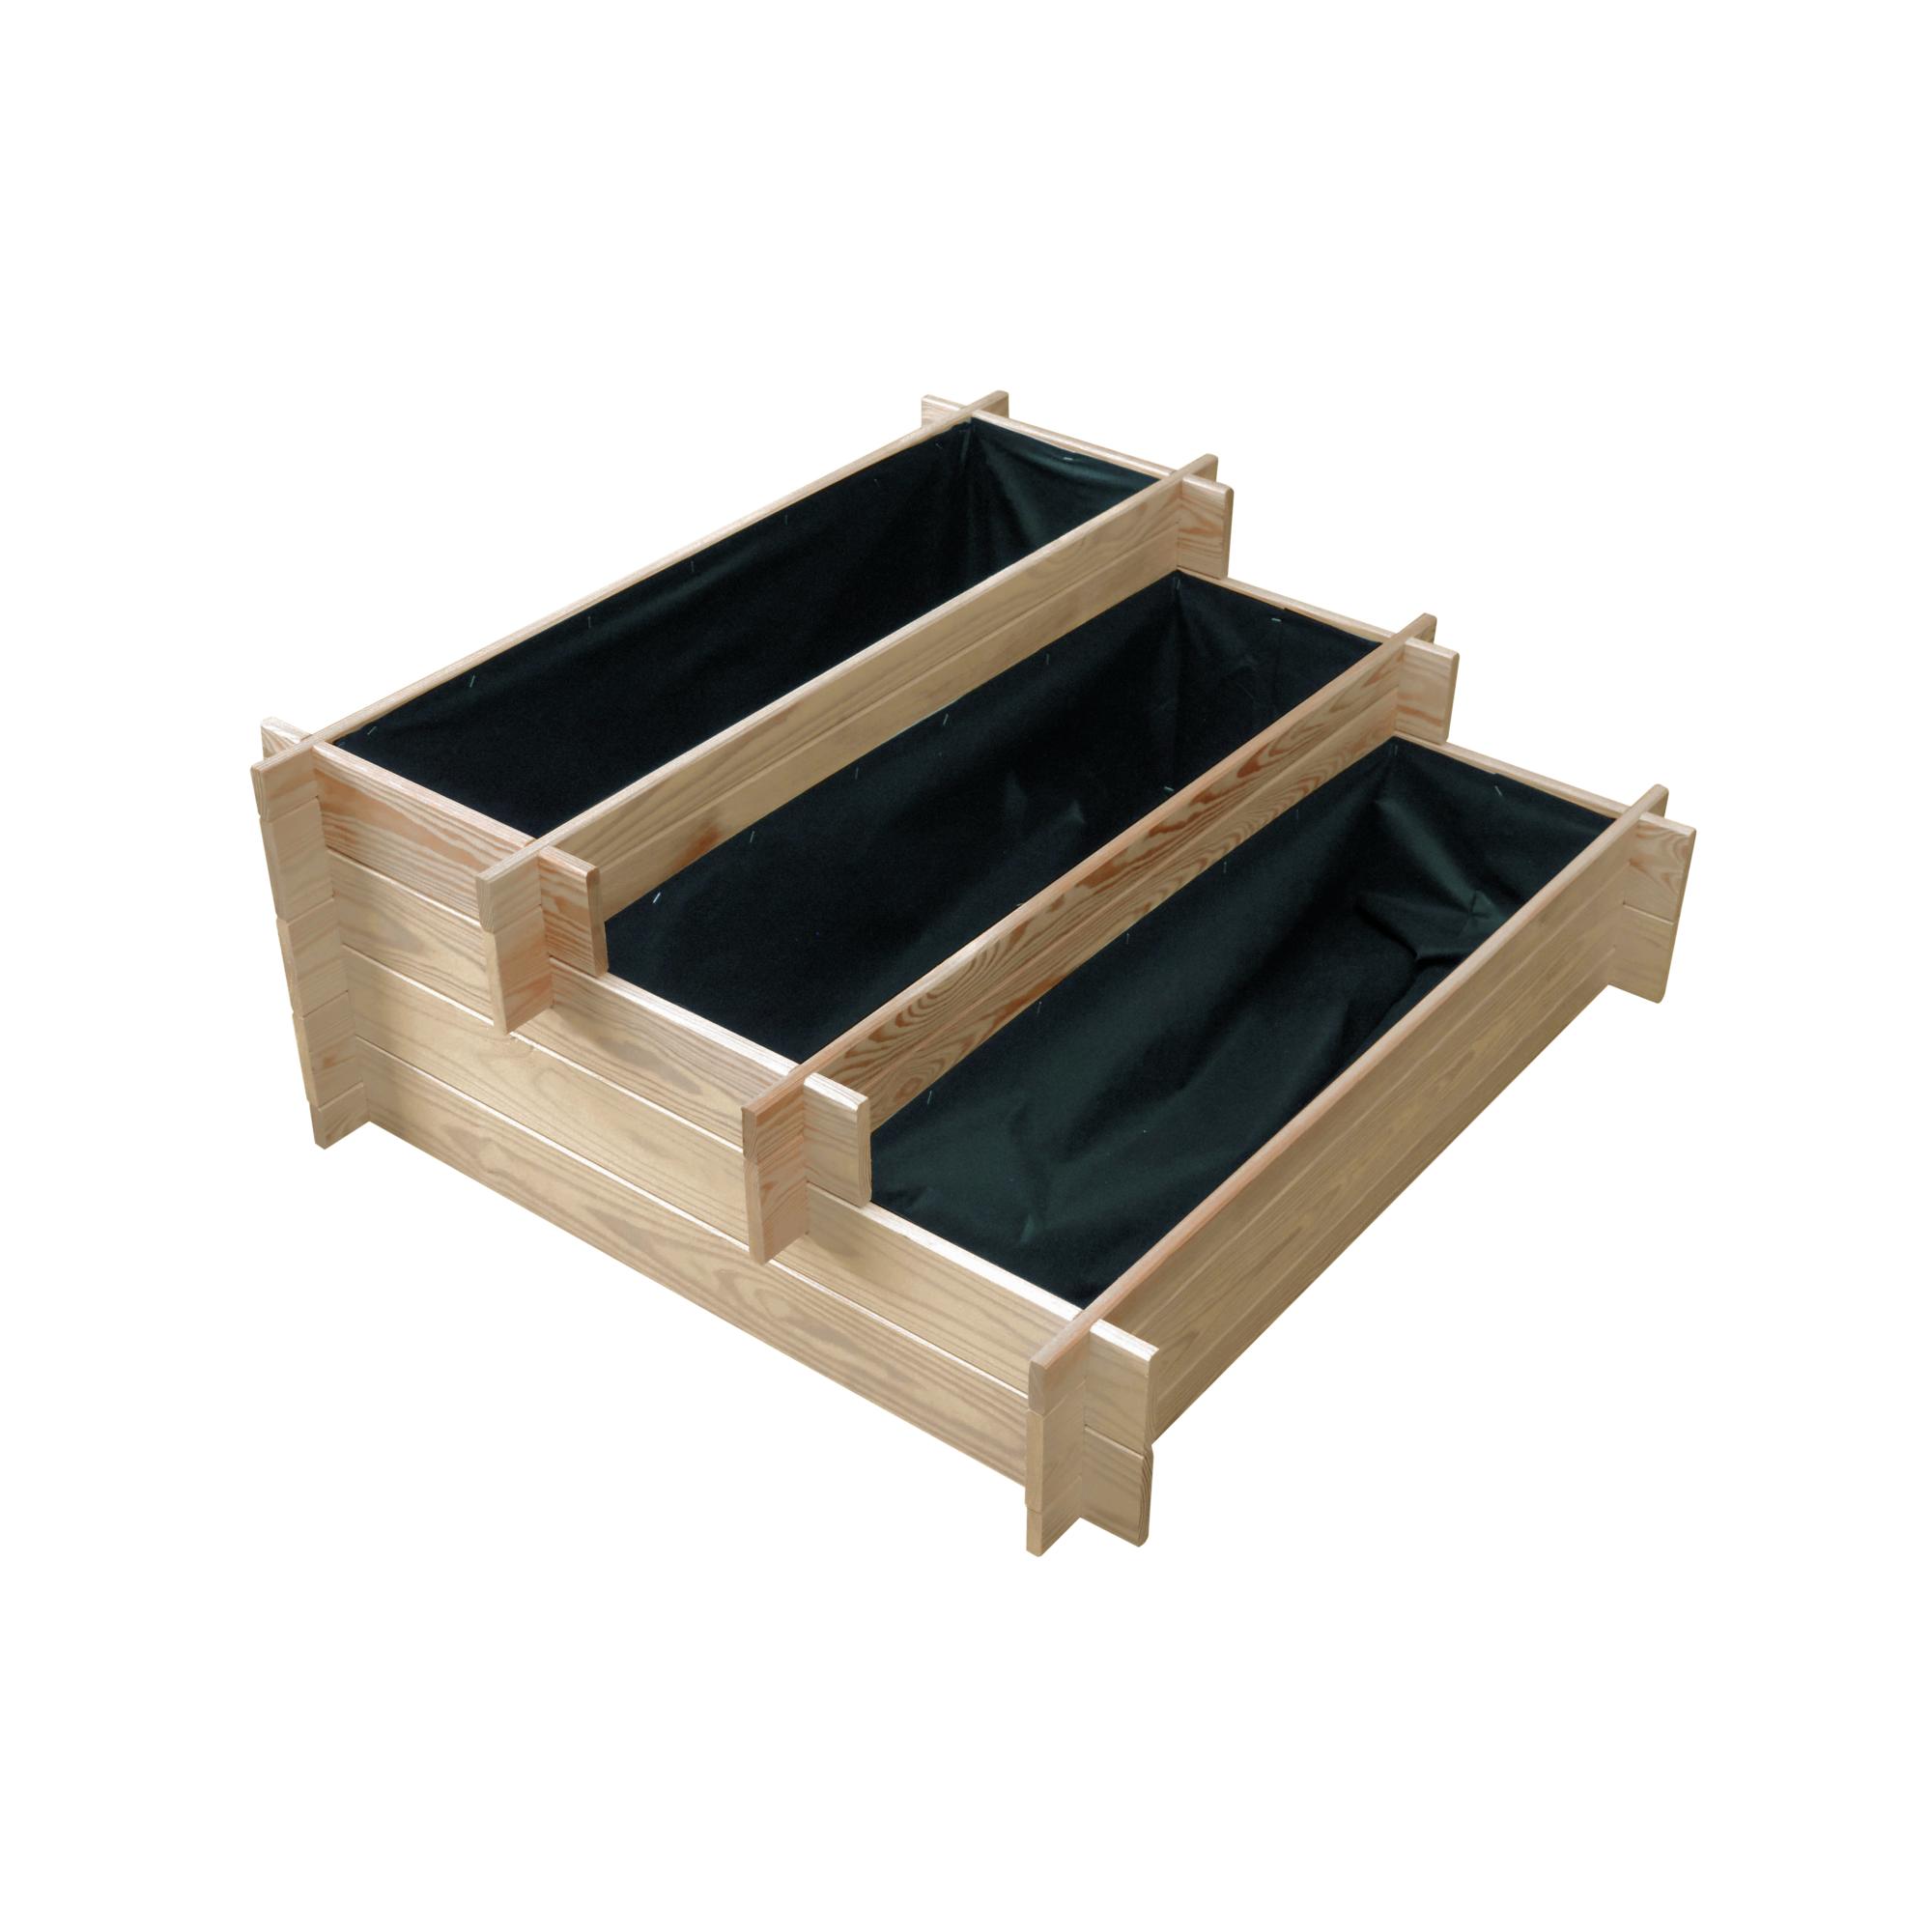 Holzbeet Linda 120 X 80 Cm Grau ǀ Toom Baumarkt